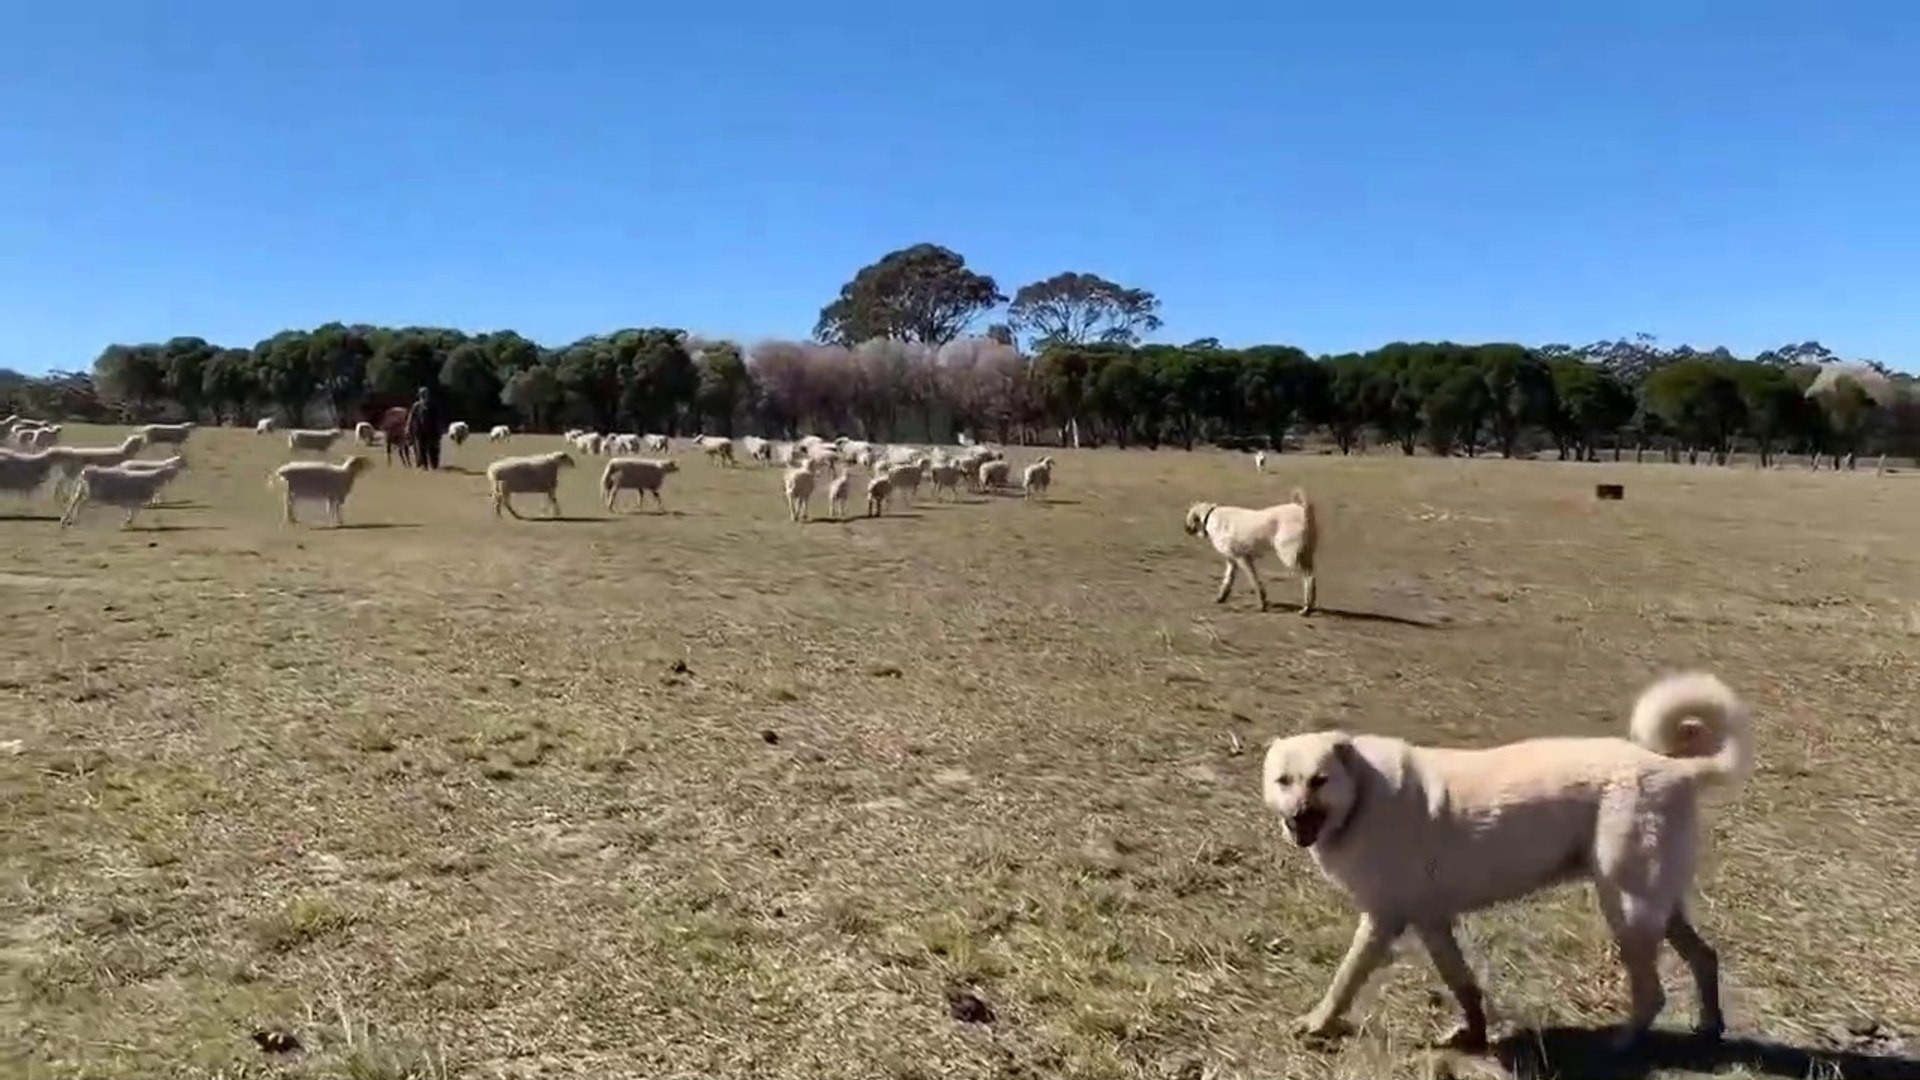 SivAS KANGALLARIN SURU GOREVi - ANATOLiAN SHEPHERD SiVAS KANGAL DOG and SHEEP